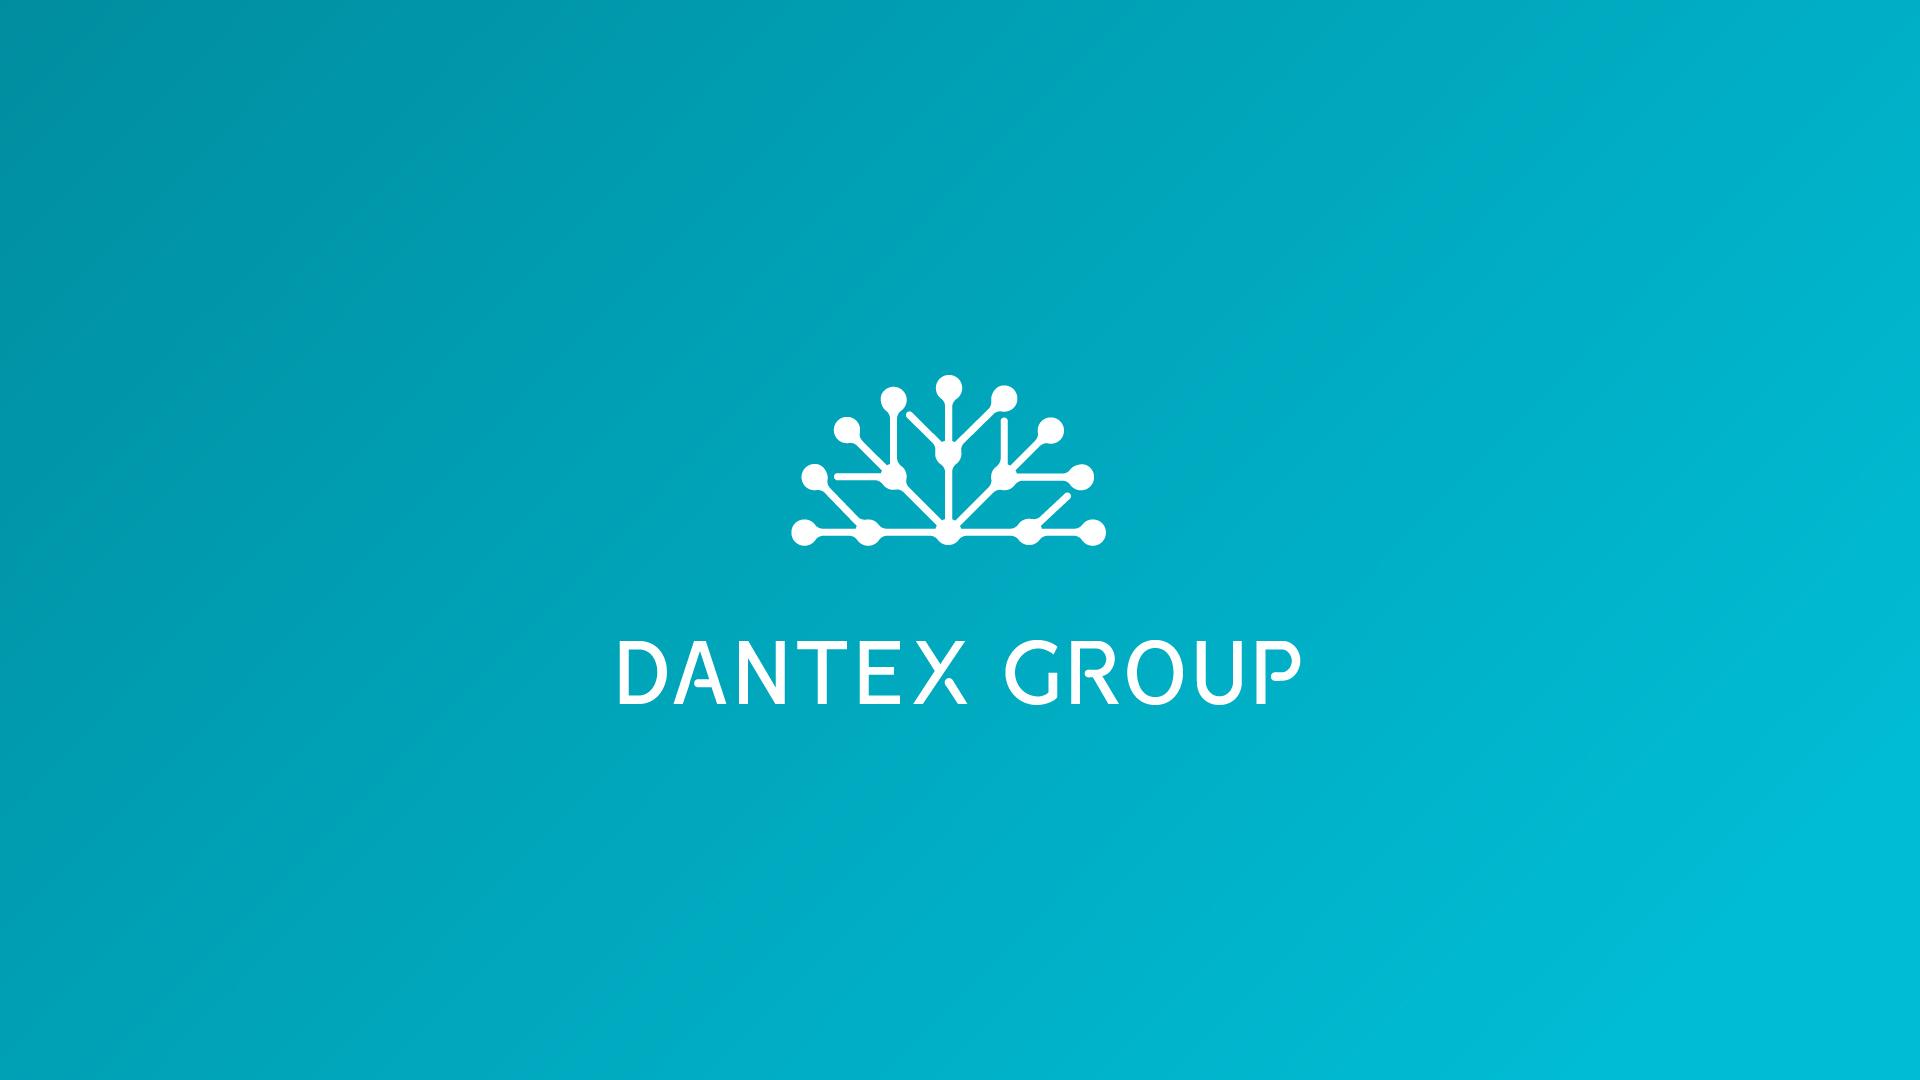 Конкурс на разработку логотипа для компании Dantex Group  фото f_8095c110b9d2228c.jpg